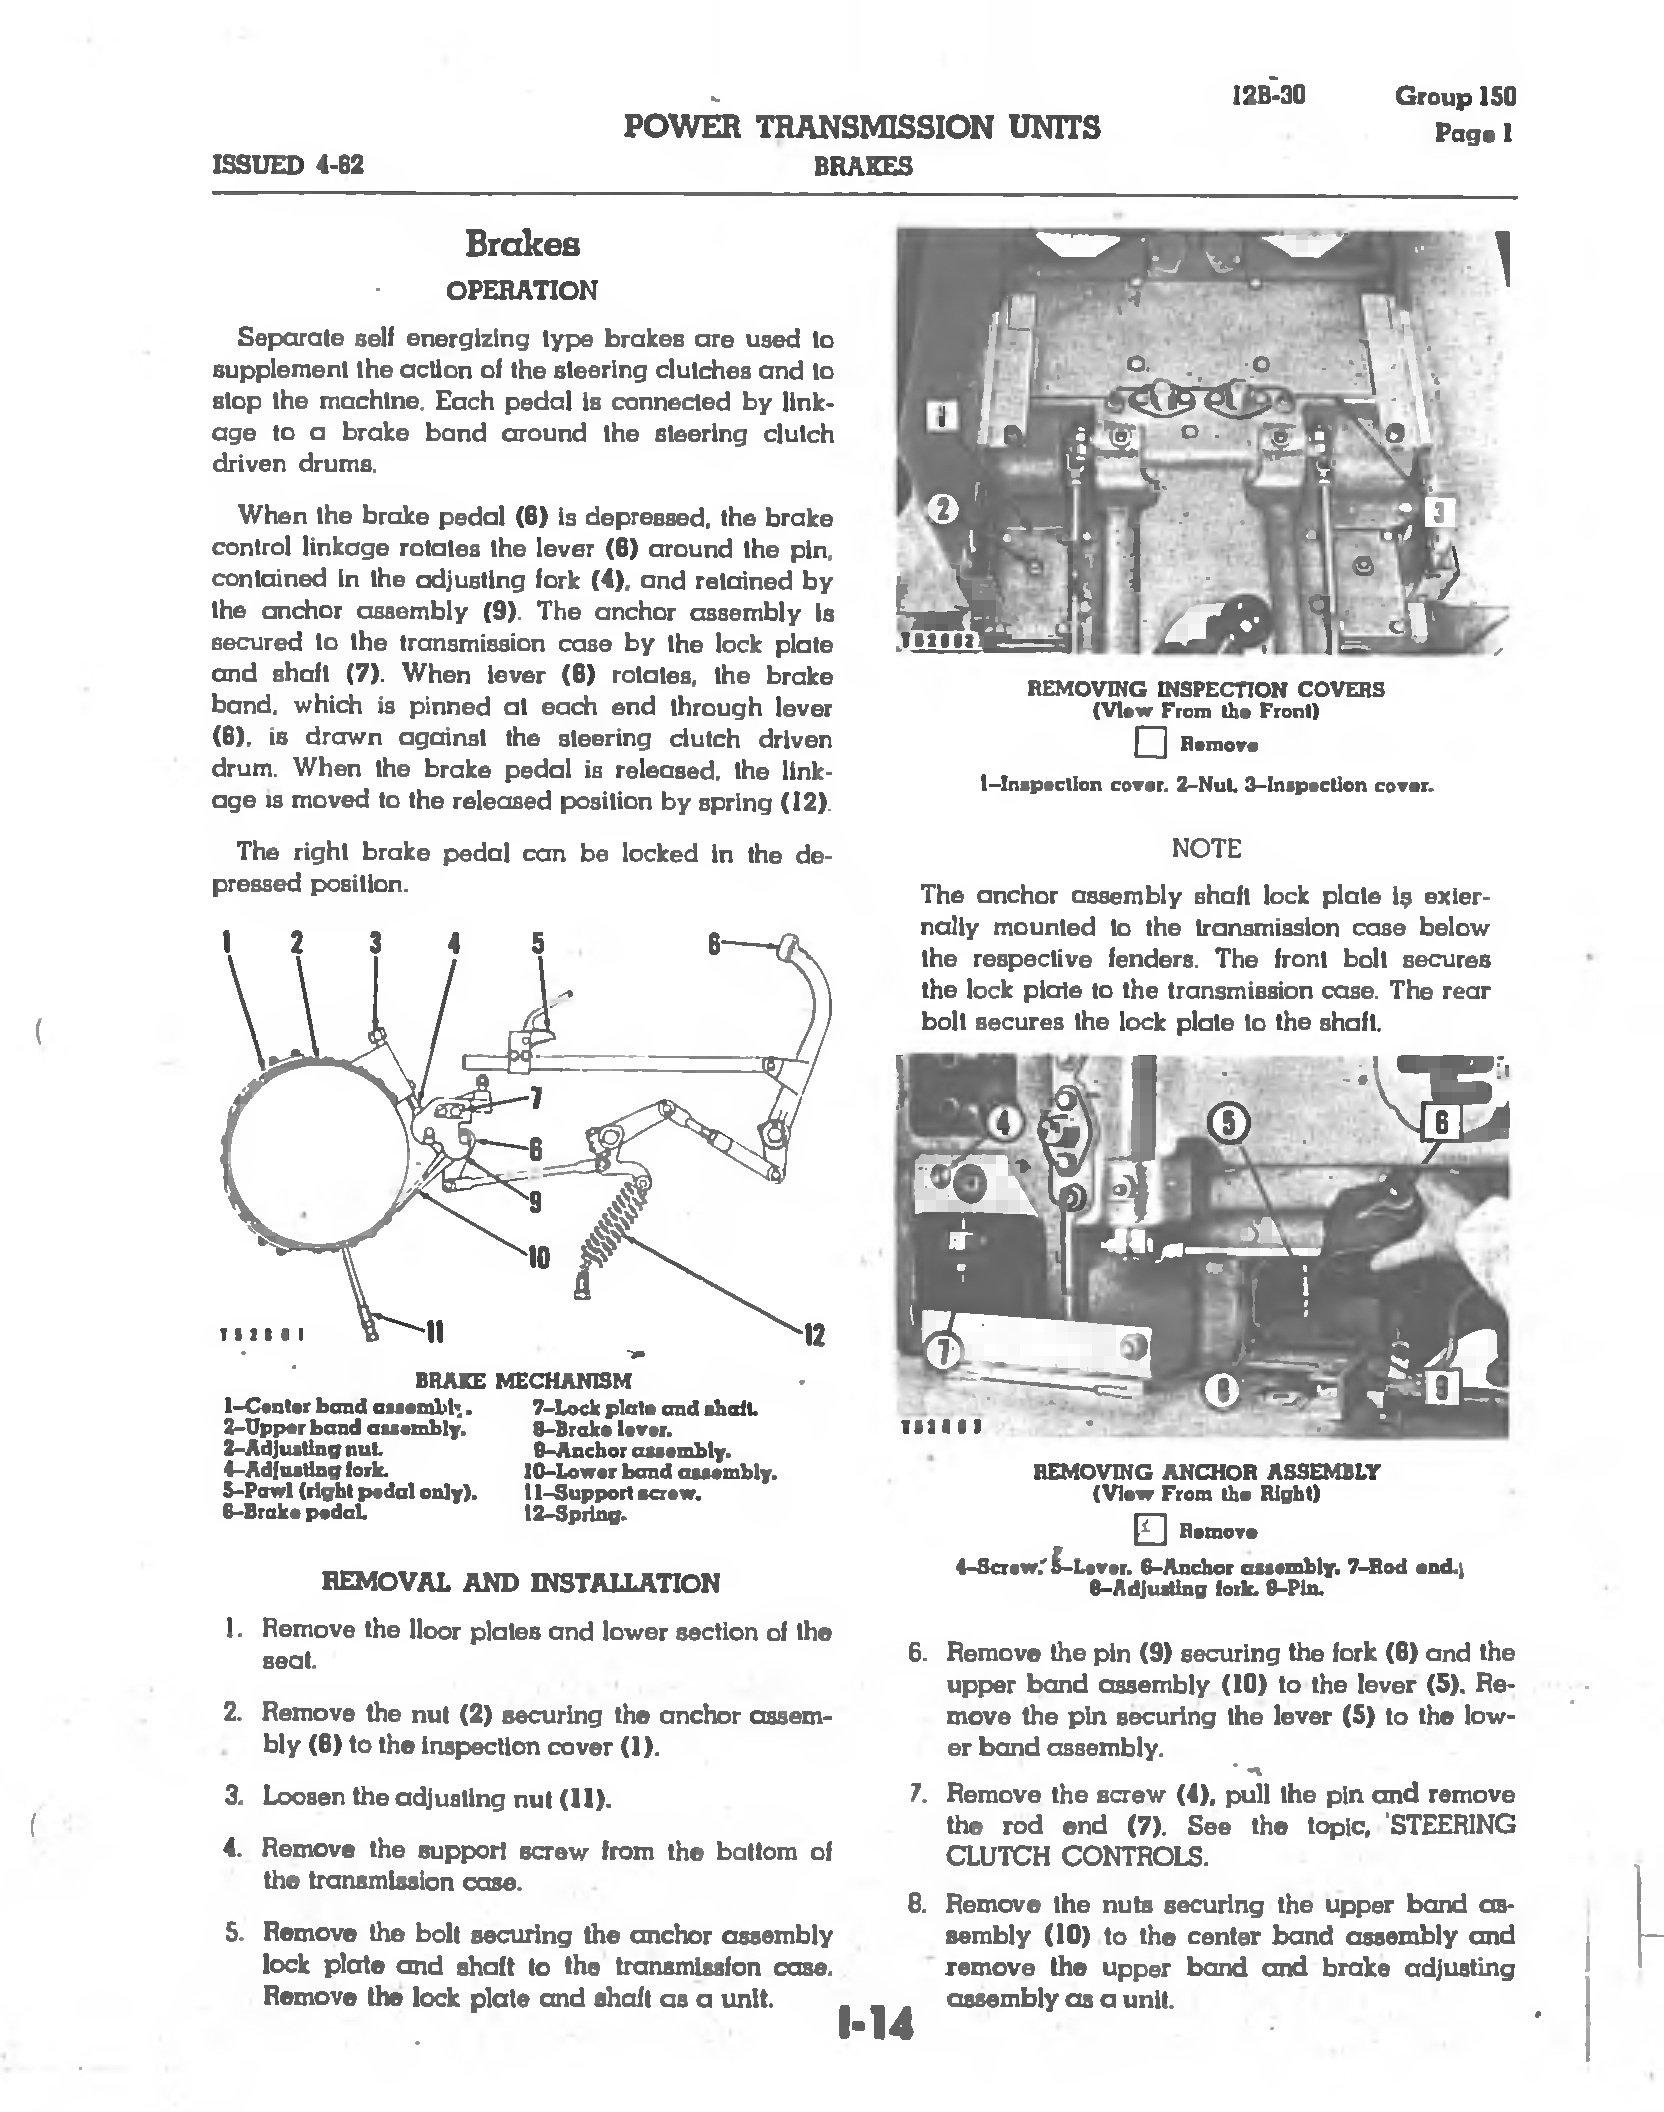 1988 d4c tranny repair